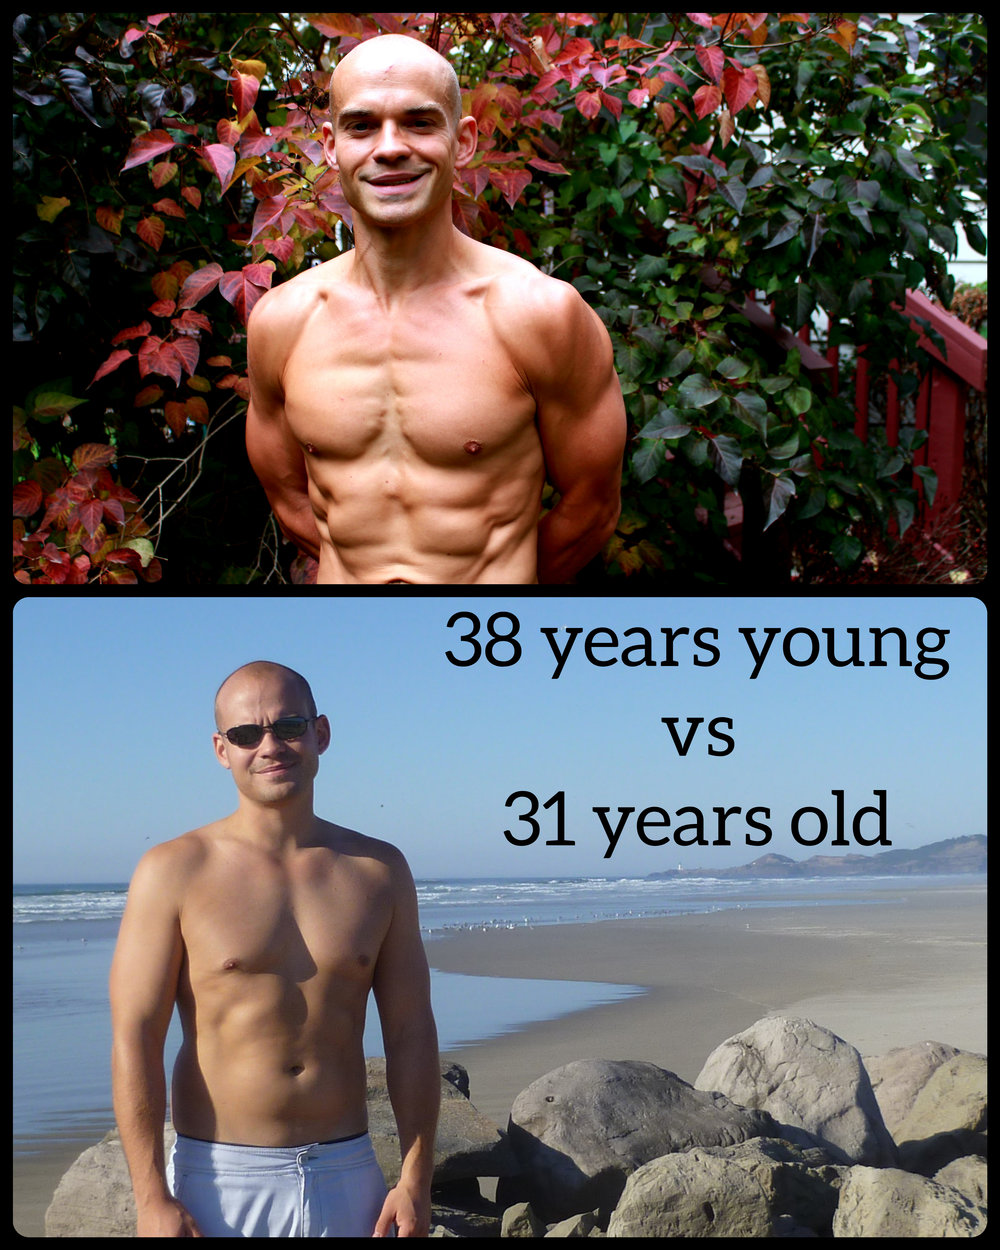 38 years young.jpg